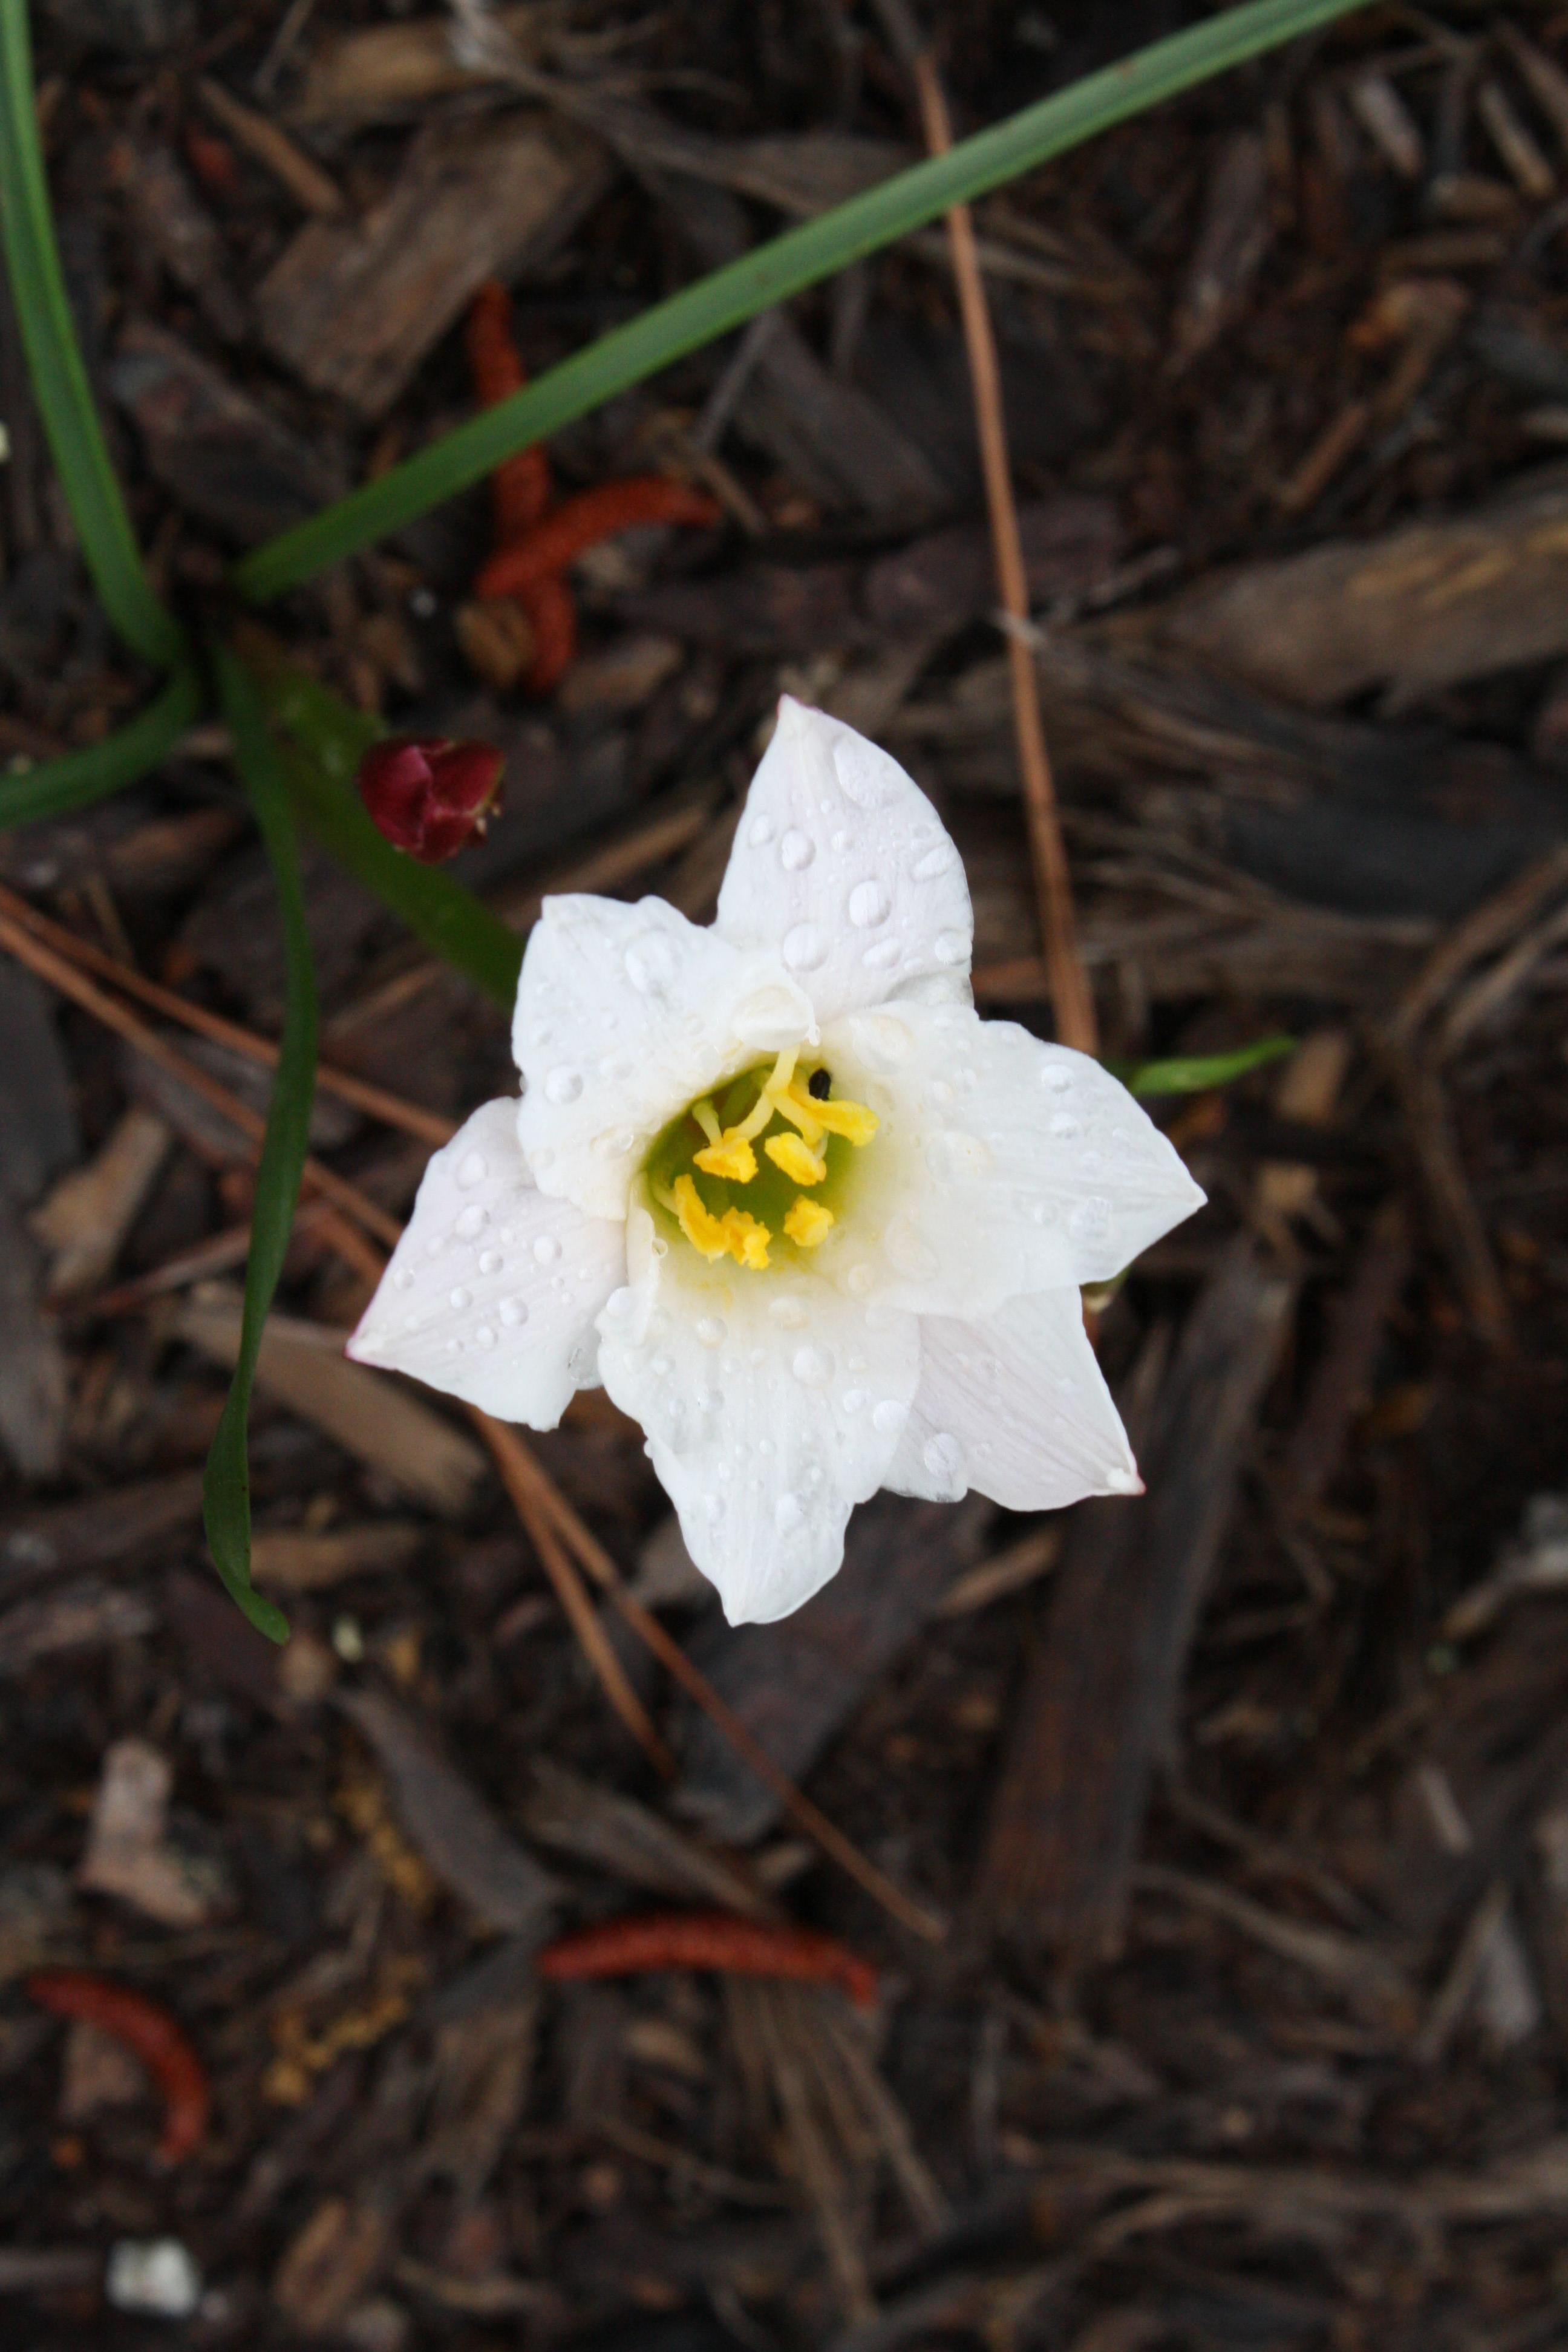 Zephyranthes simpsonii Marion Co. FL @ JLBG